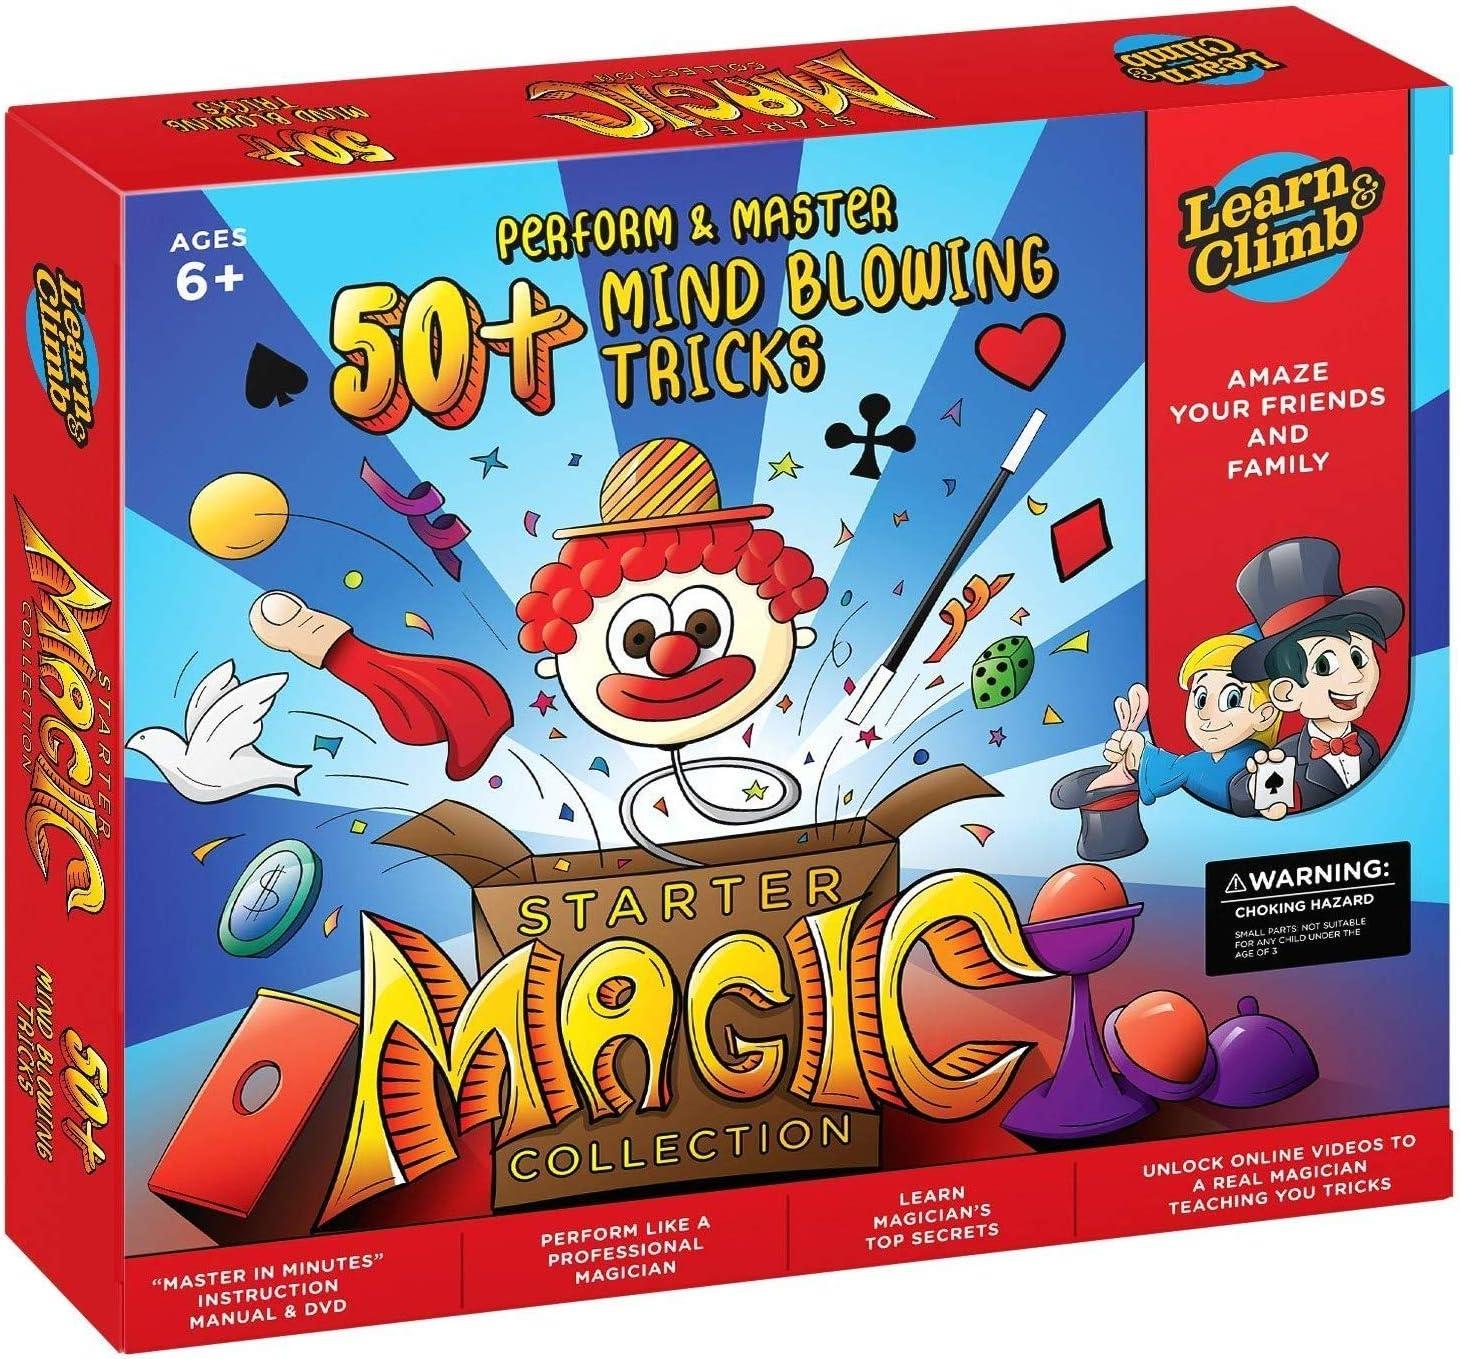 Learn & Climb Magic kit Set for Kids - 50+ Magic Tricks. Clear Instruction Manual & DVD: Toys & Games